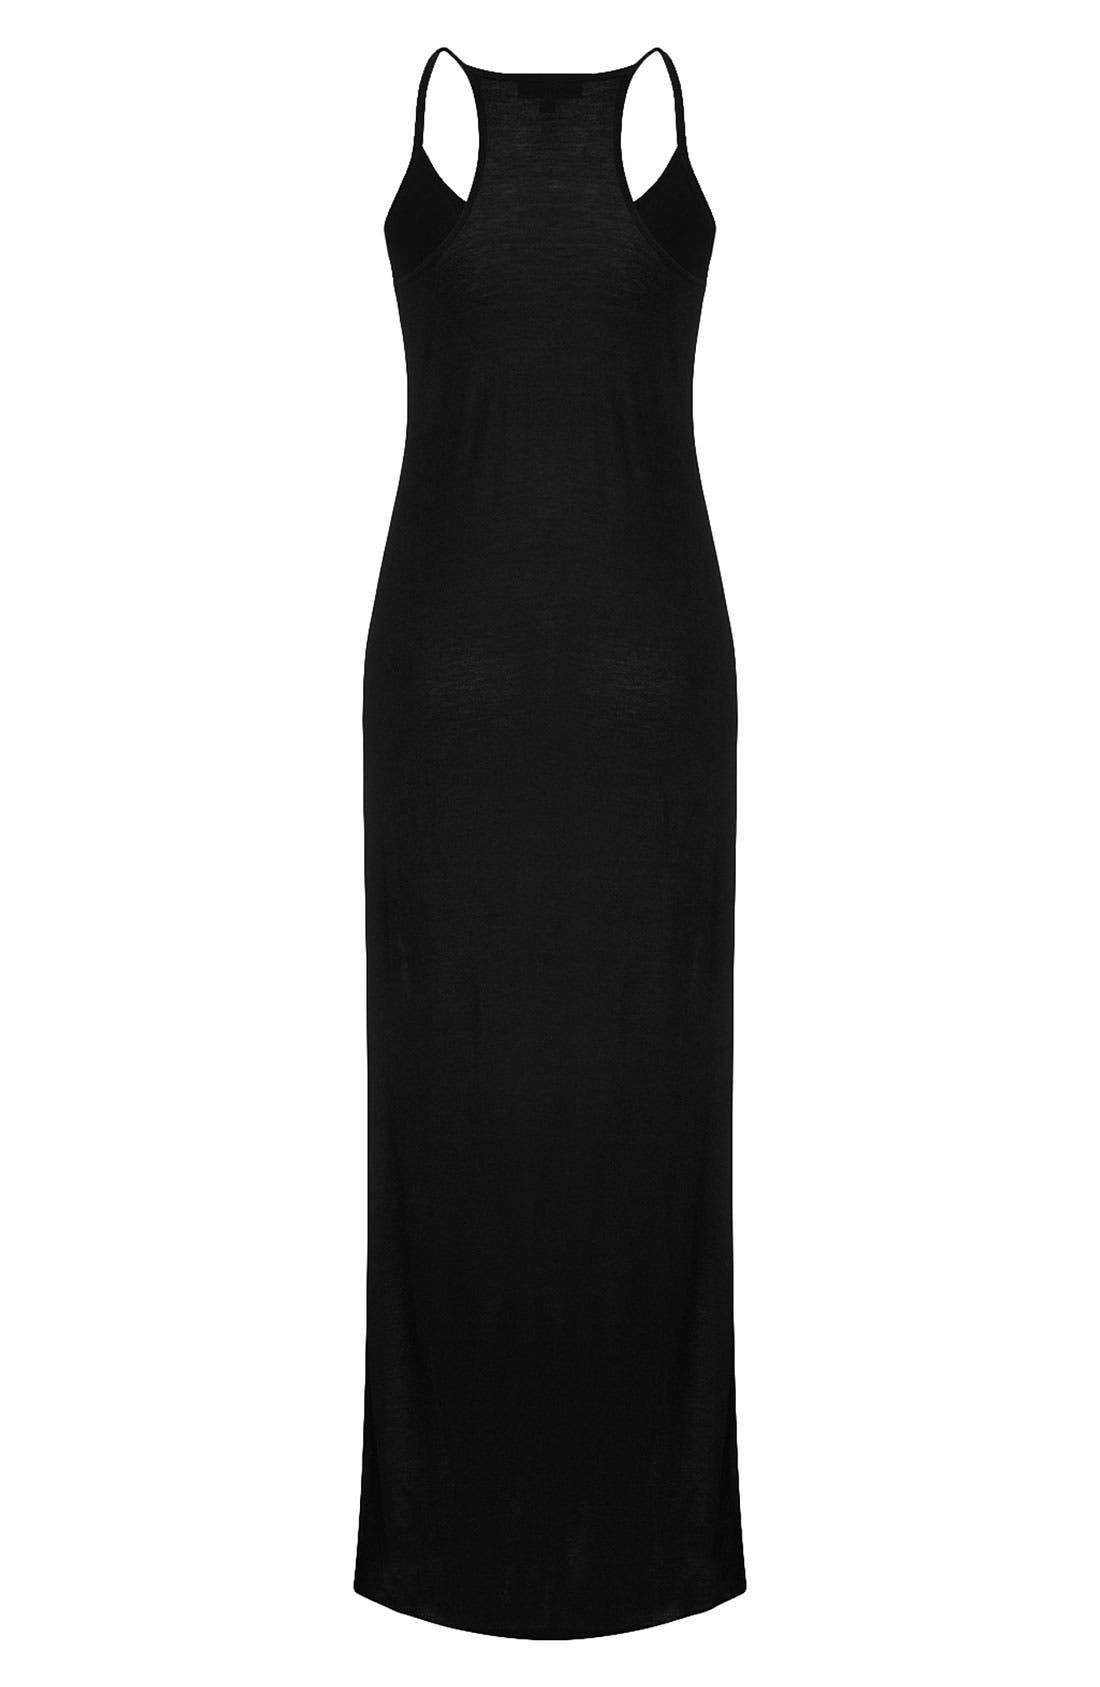 Main Image - Topshop Cami Strap Maxi Dress